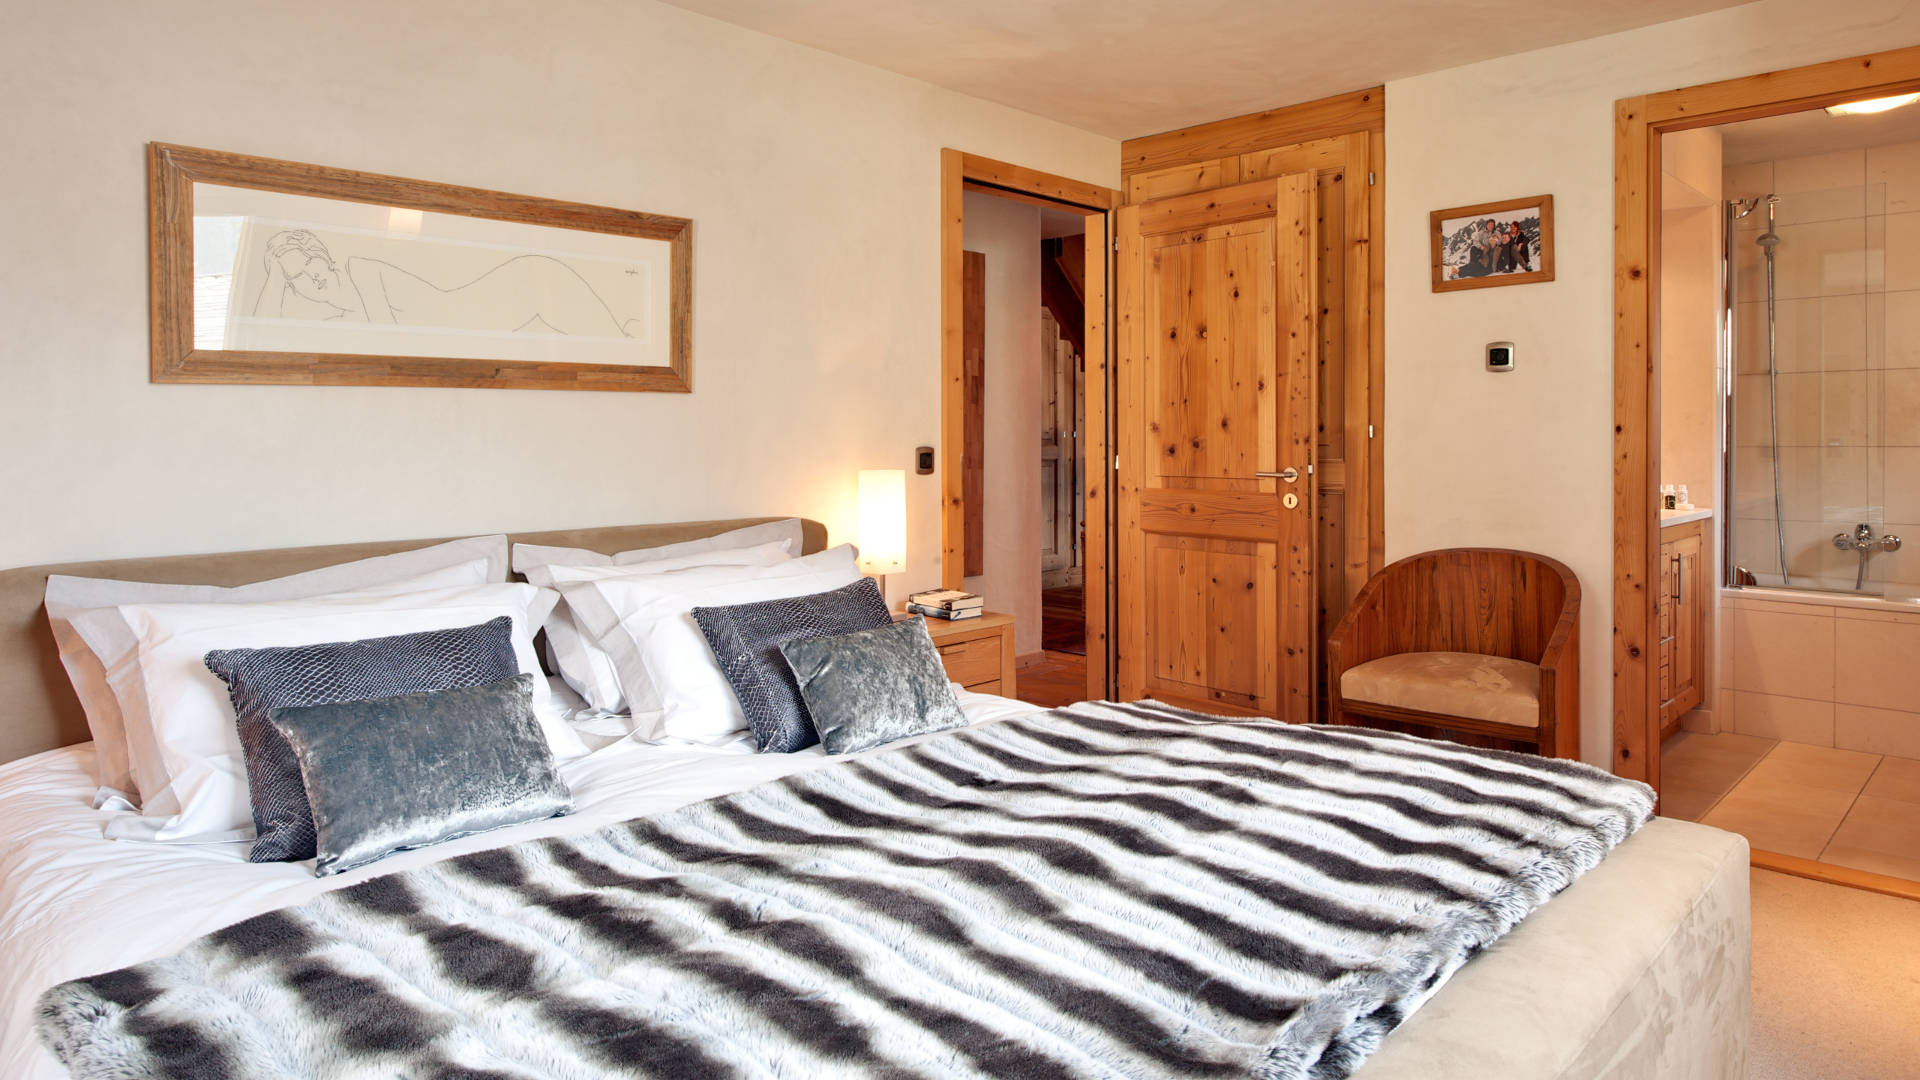 chalet-ect-bedroom1-2